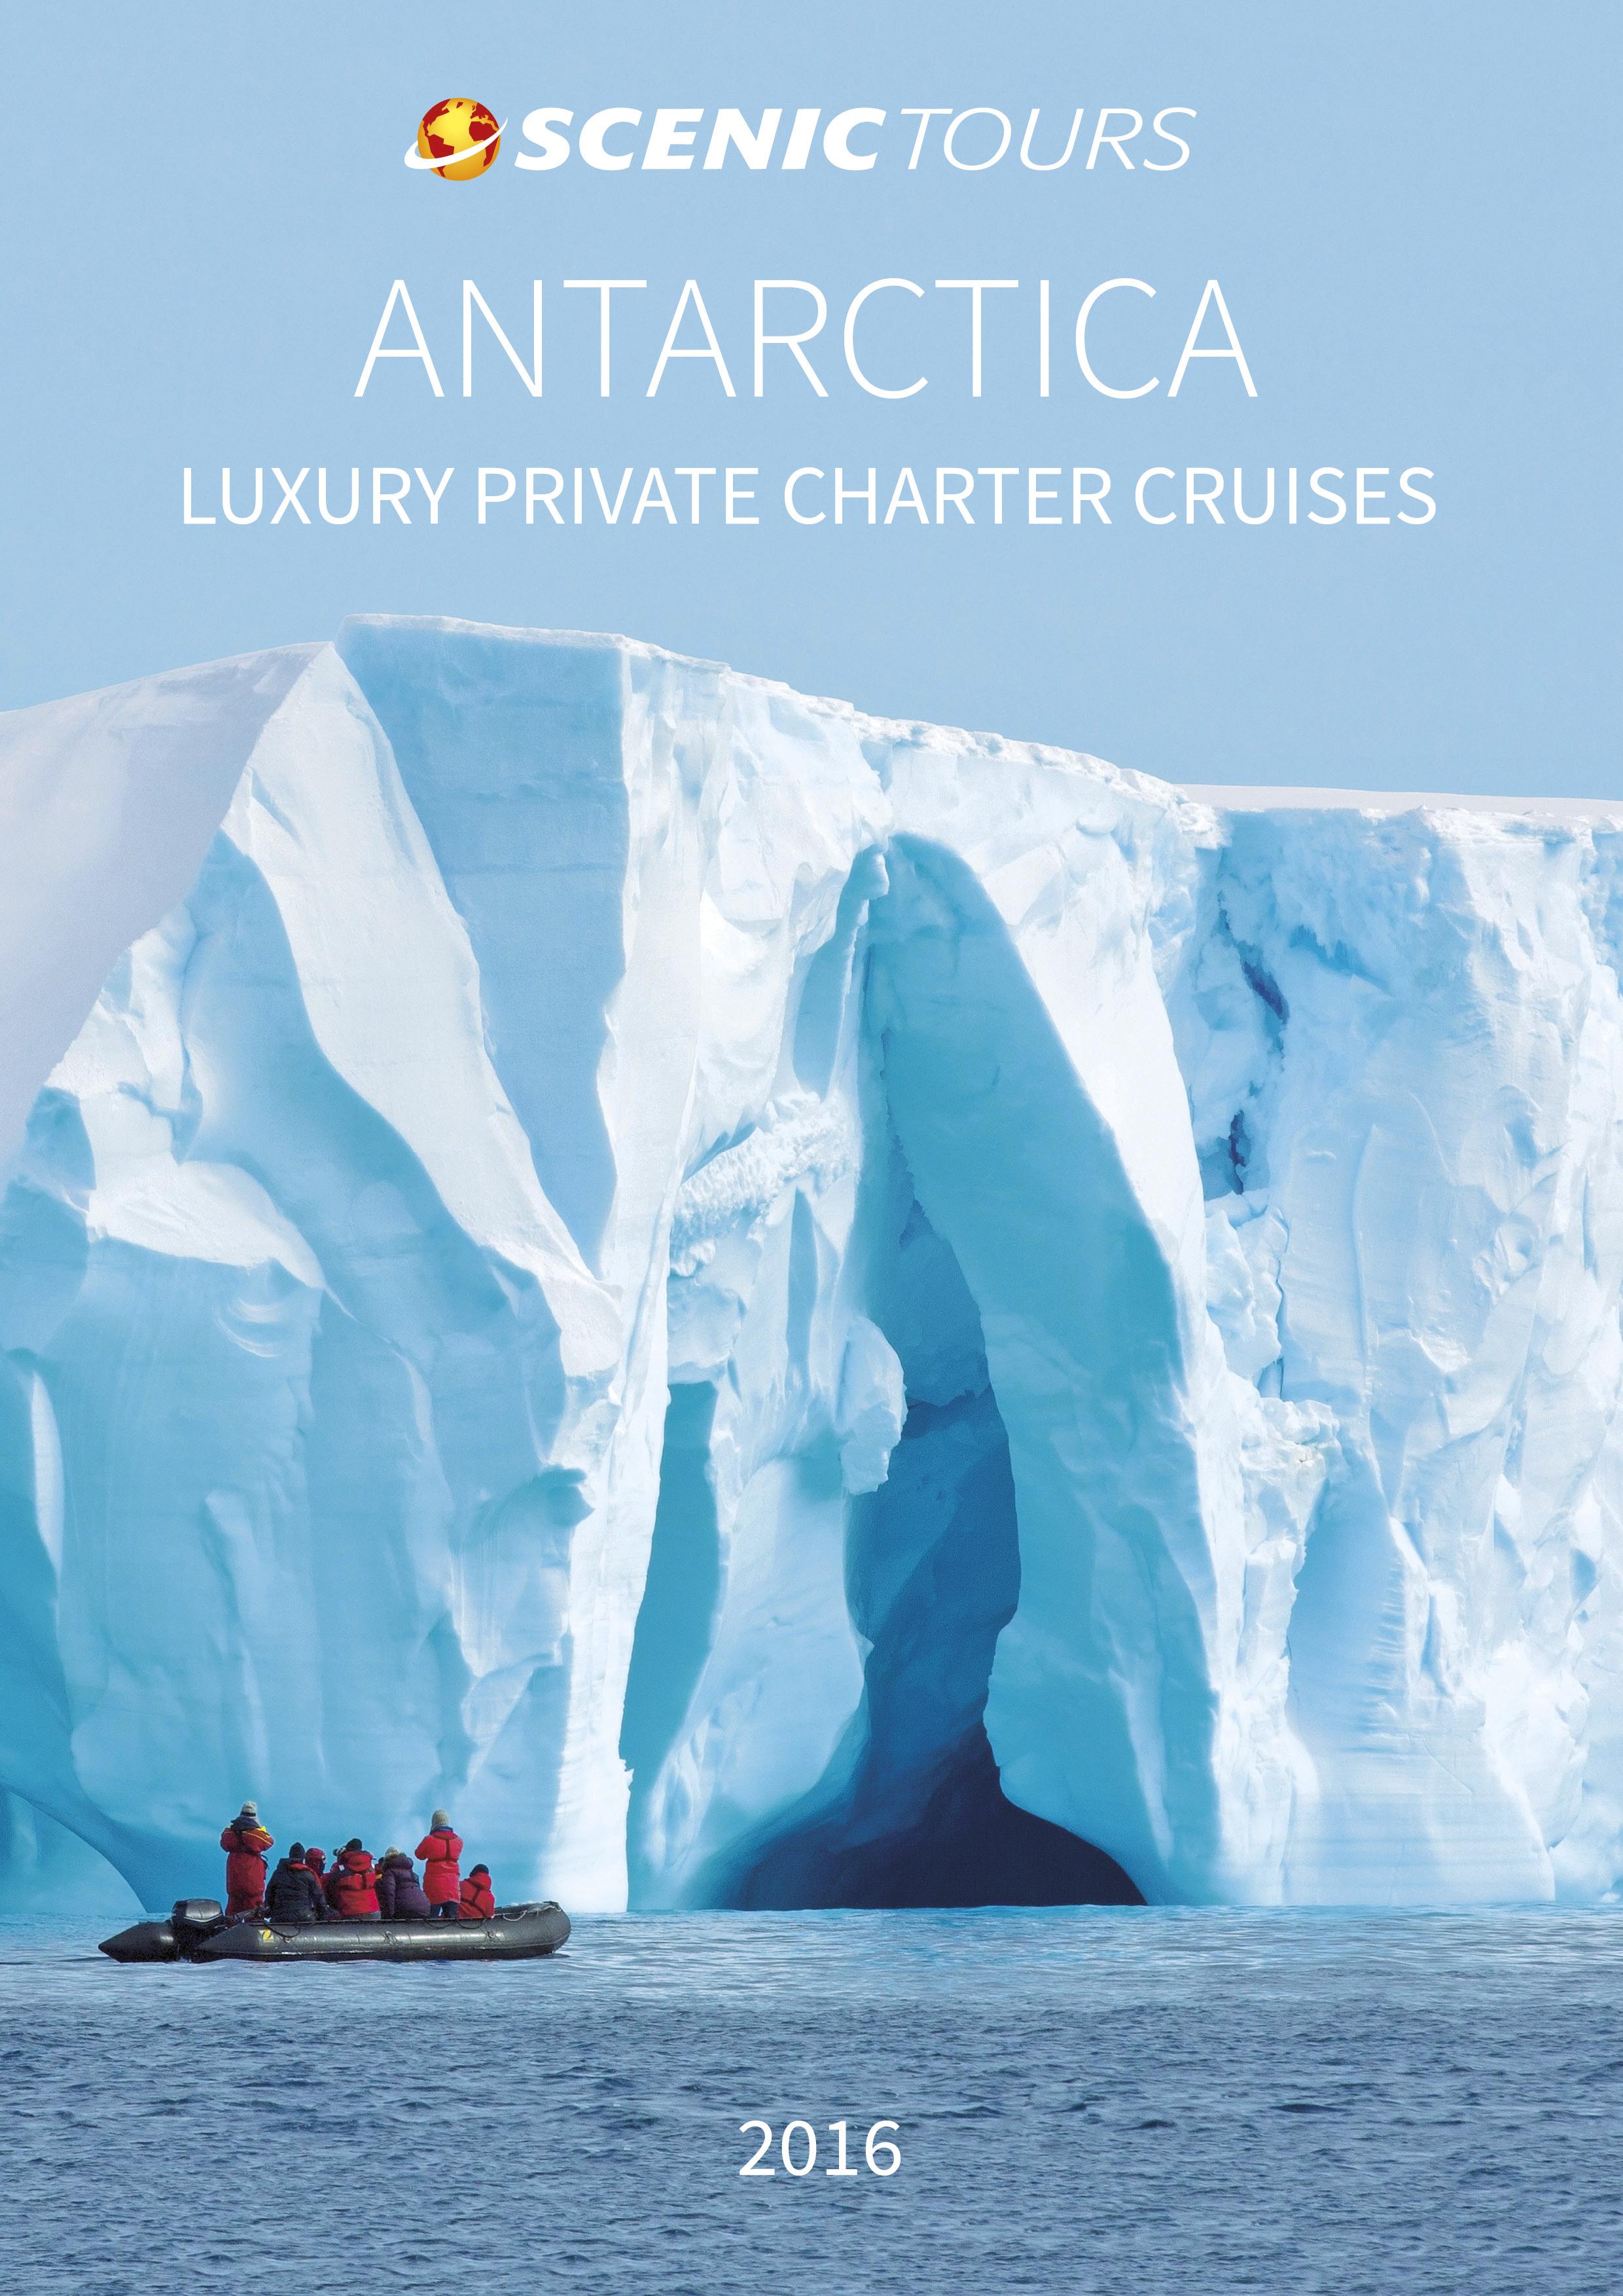 Scenic Tours Launch Antarctica Program 2016  Cruise Weekly